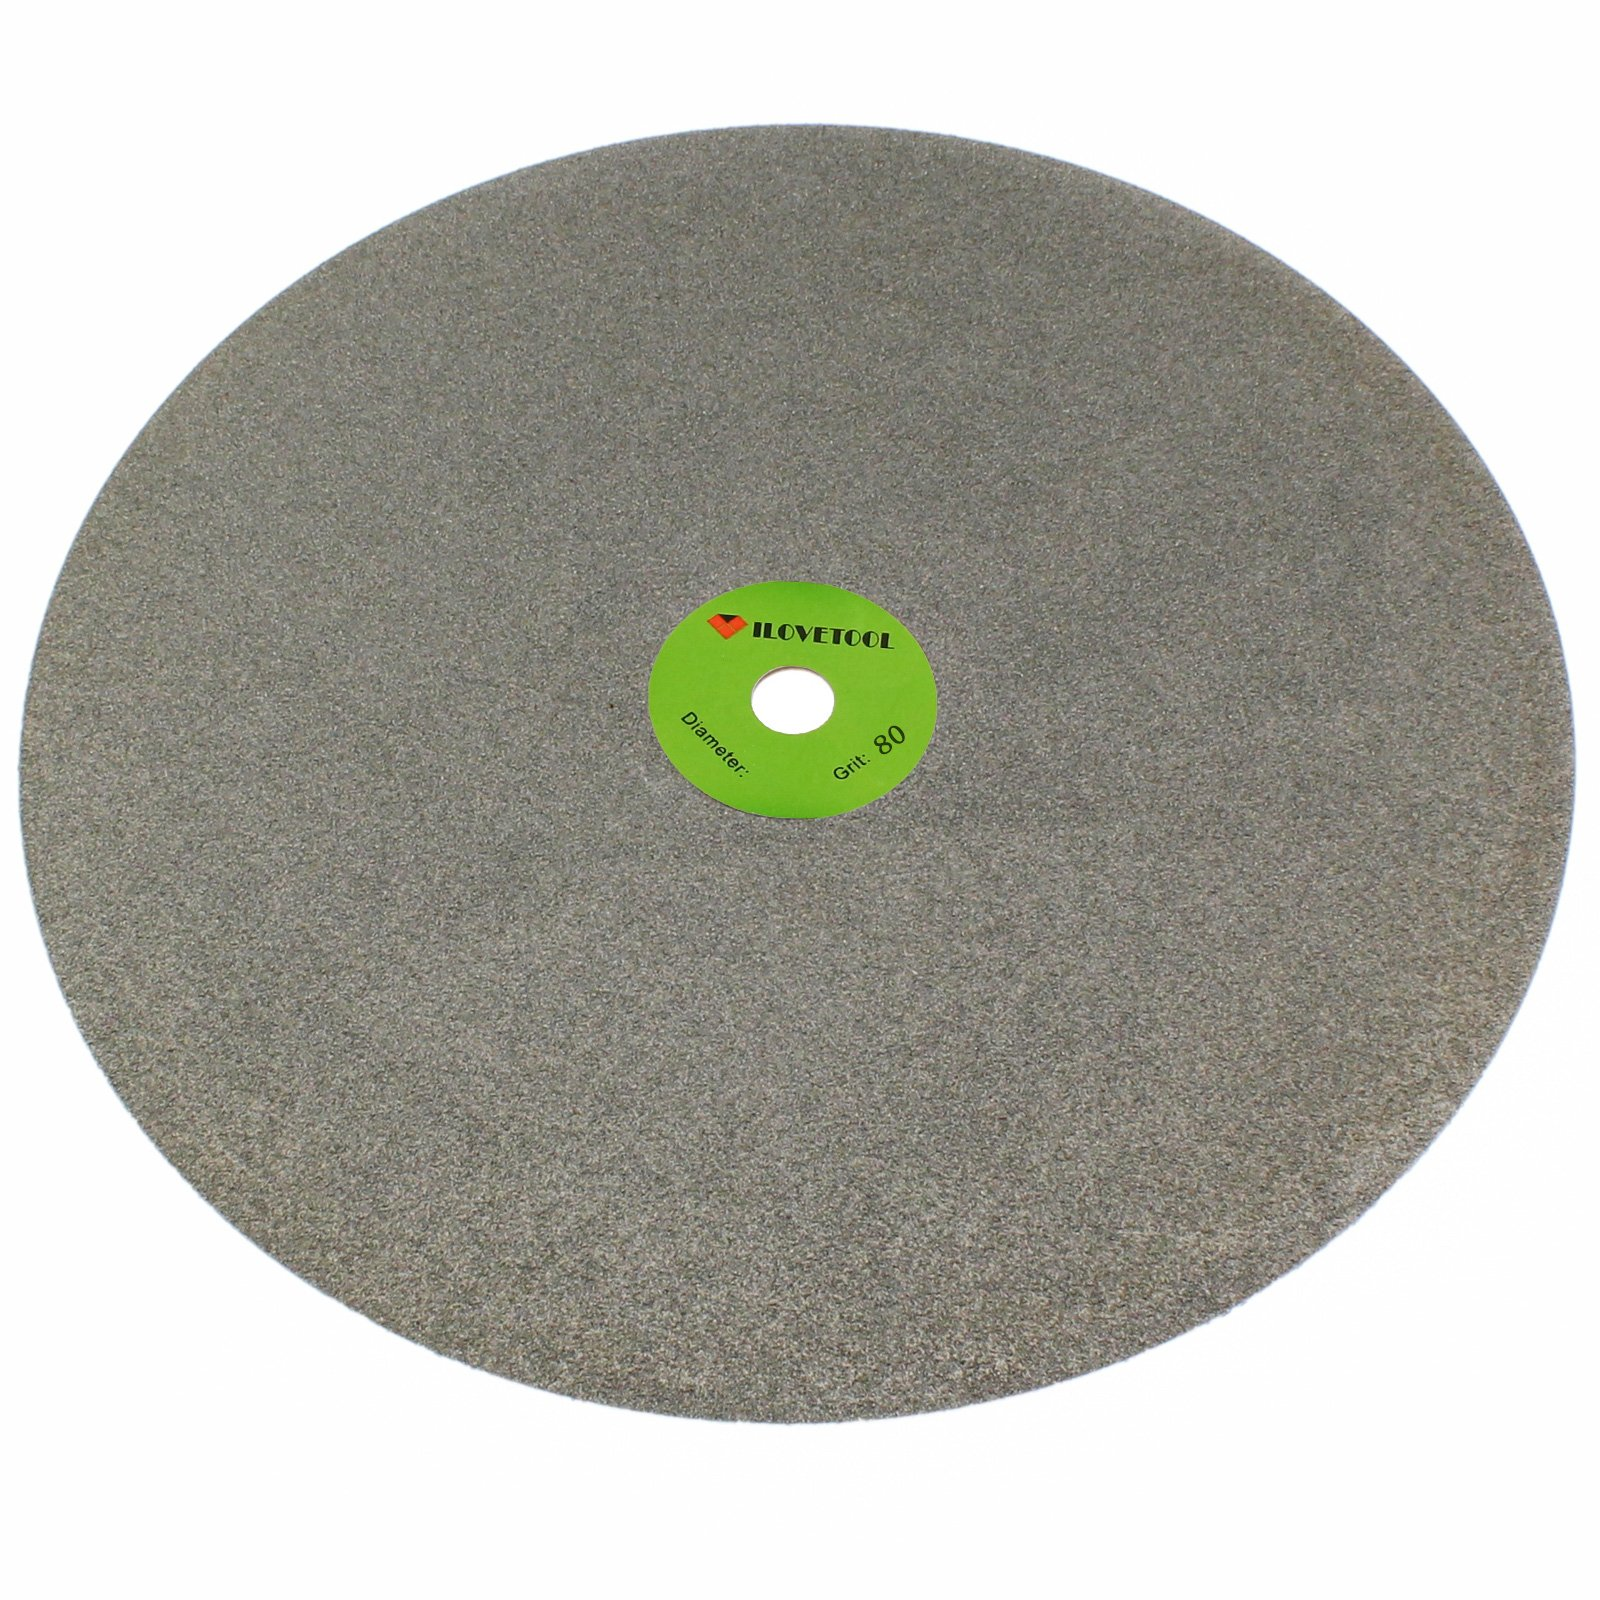 ILOVETOOL Diamond Lapping Wheel 20 inch Grinding Disc 100 Grit Coarse Lapidary Tools